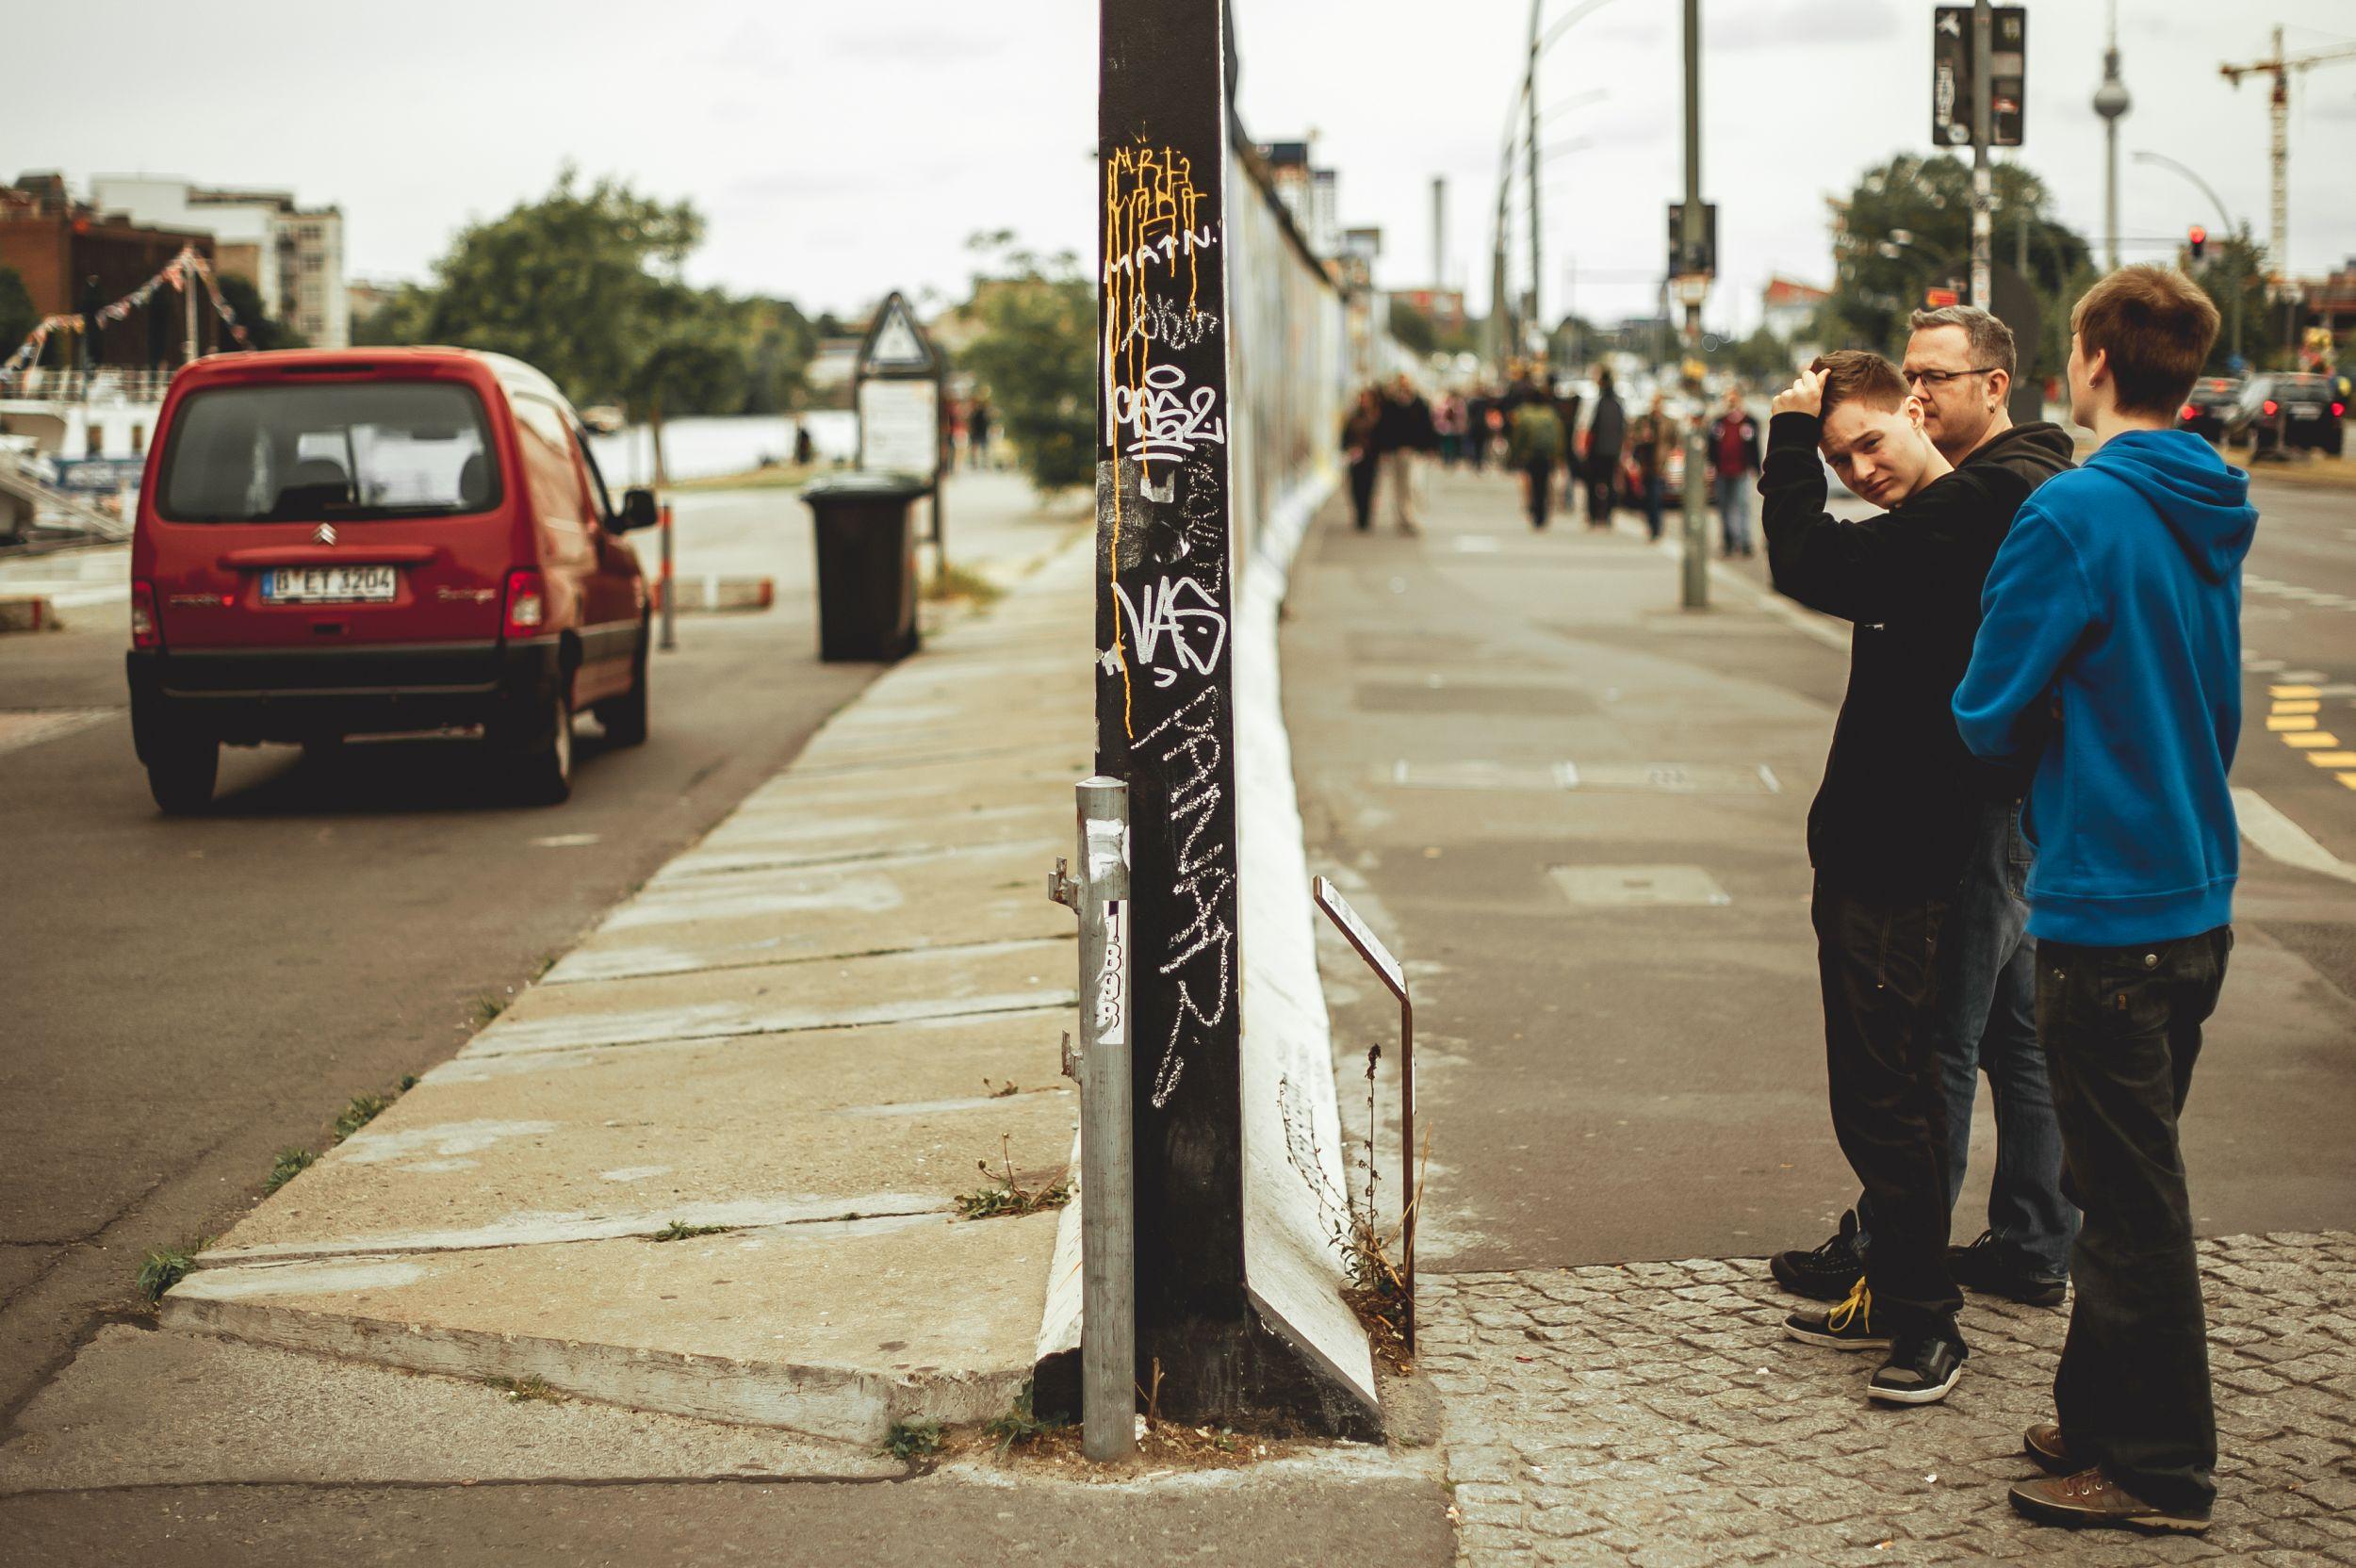 Berlin, 2012 rok (fot. A. Aleksandravicius / Shutterstock.com)